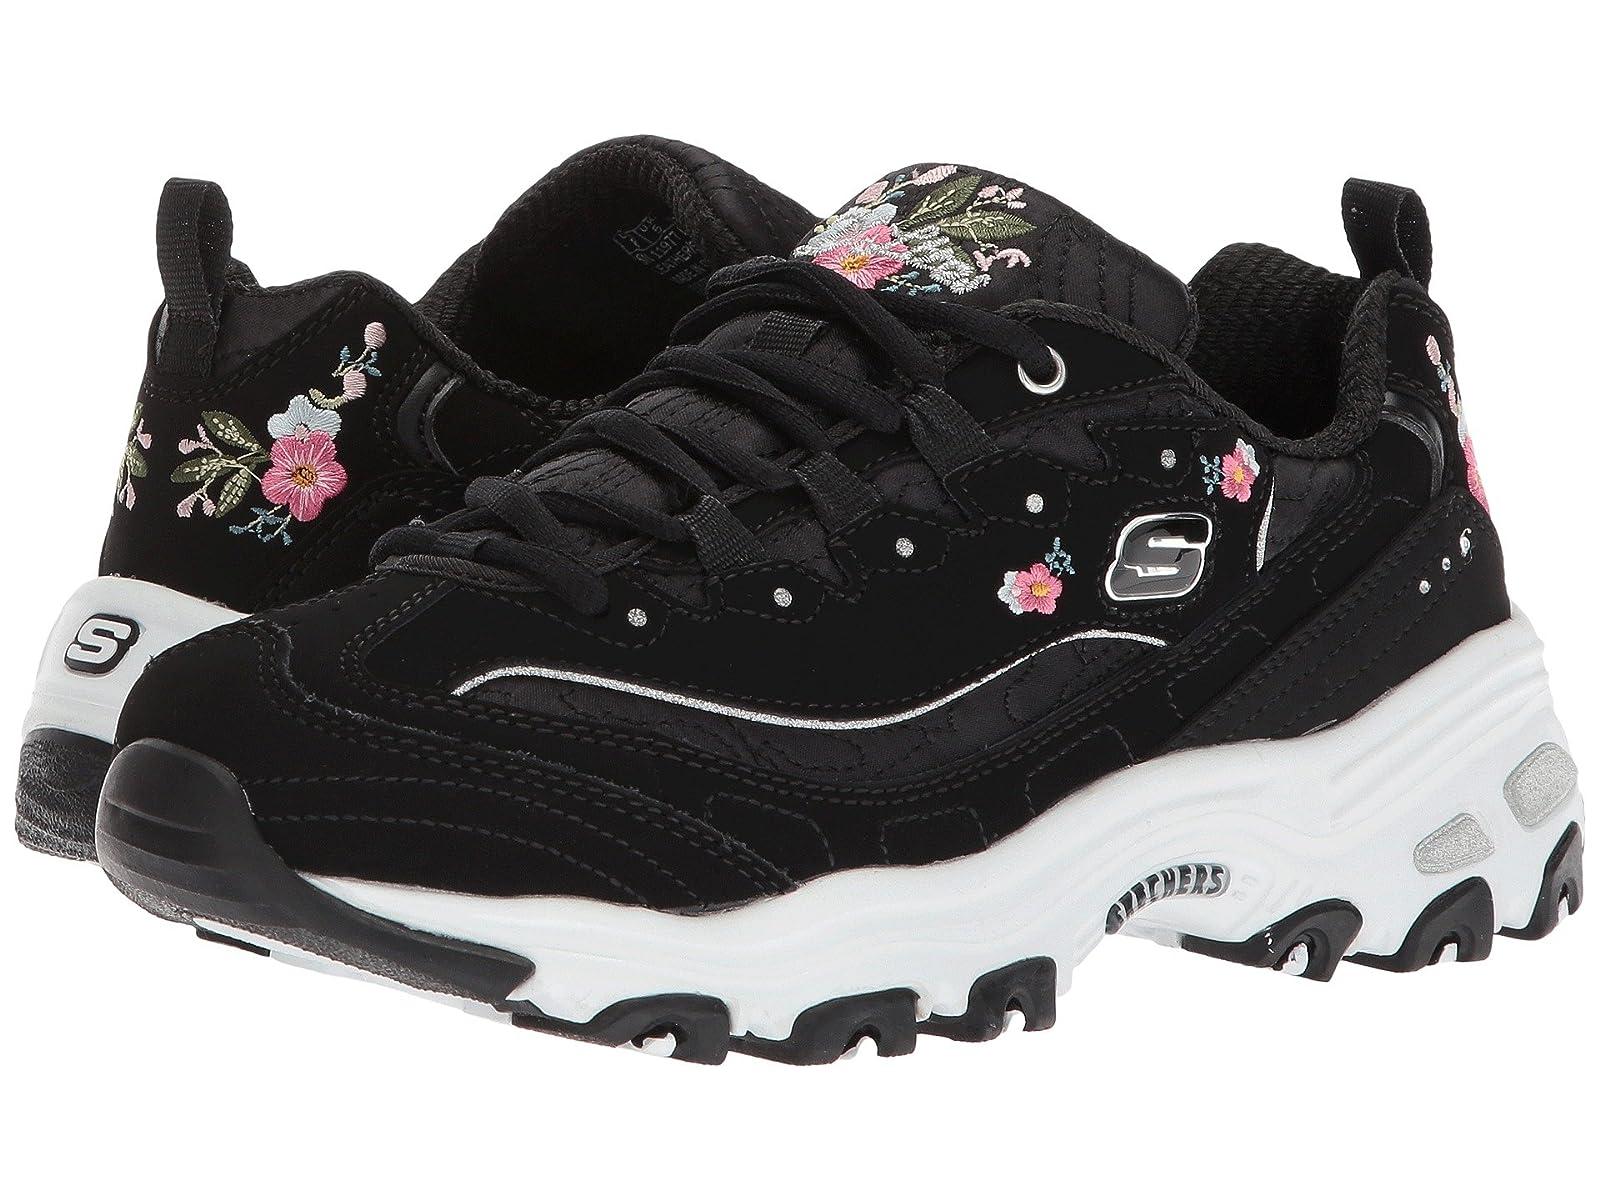 SKECHERS D'Lites Bright BlossomAtmospheric grades have affordable shoes